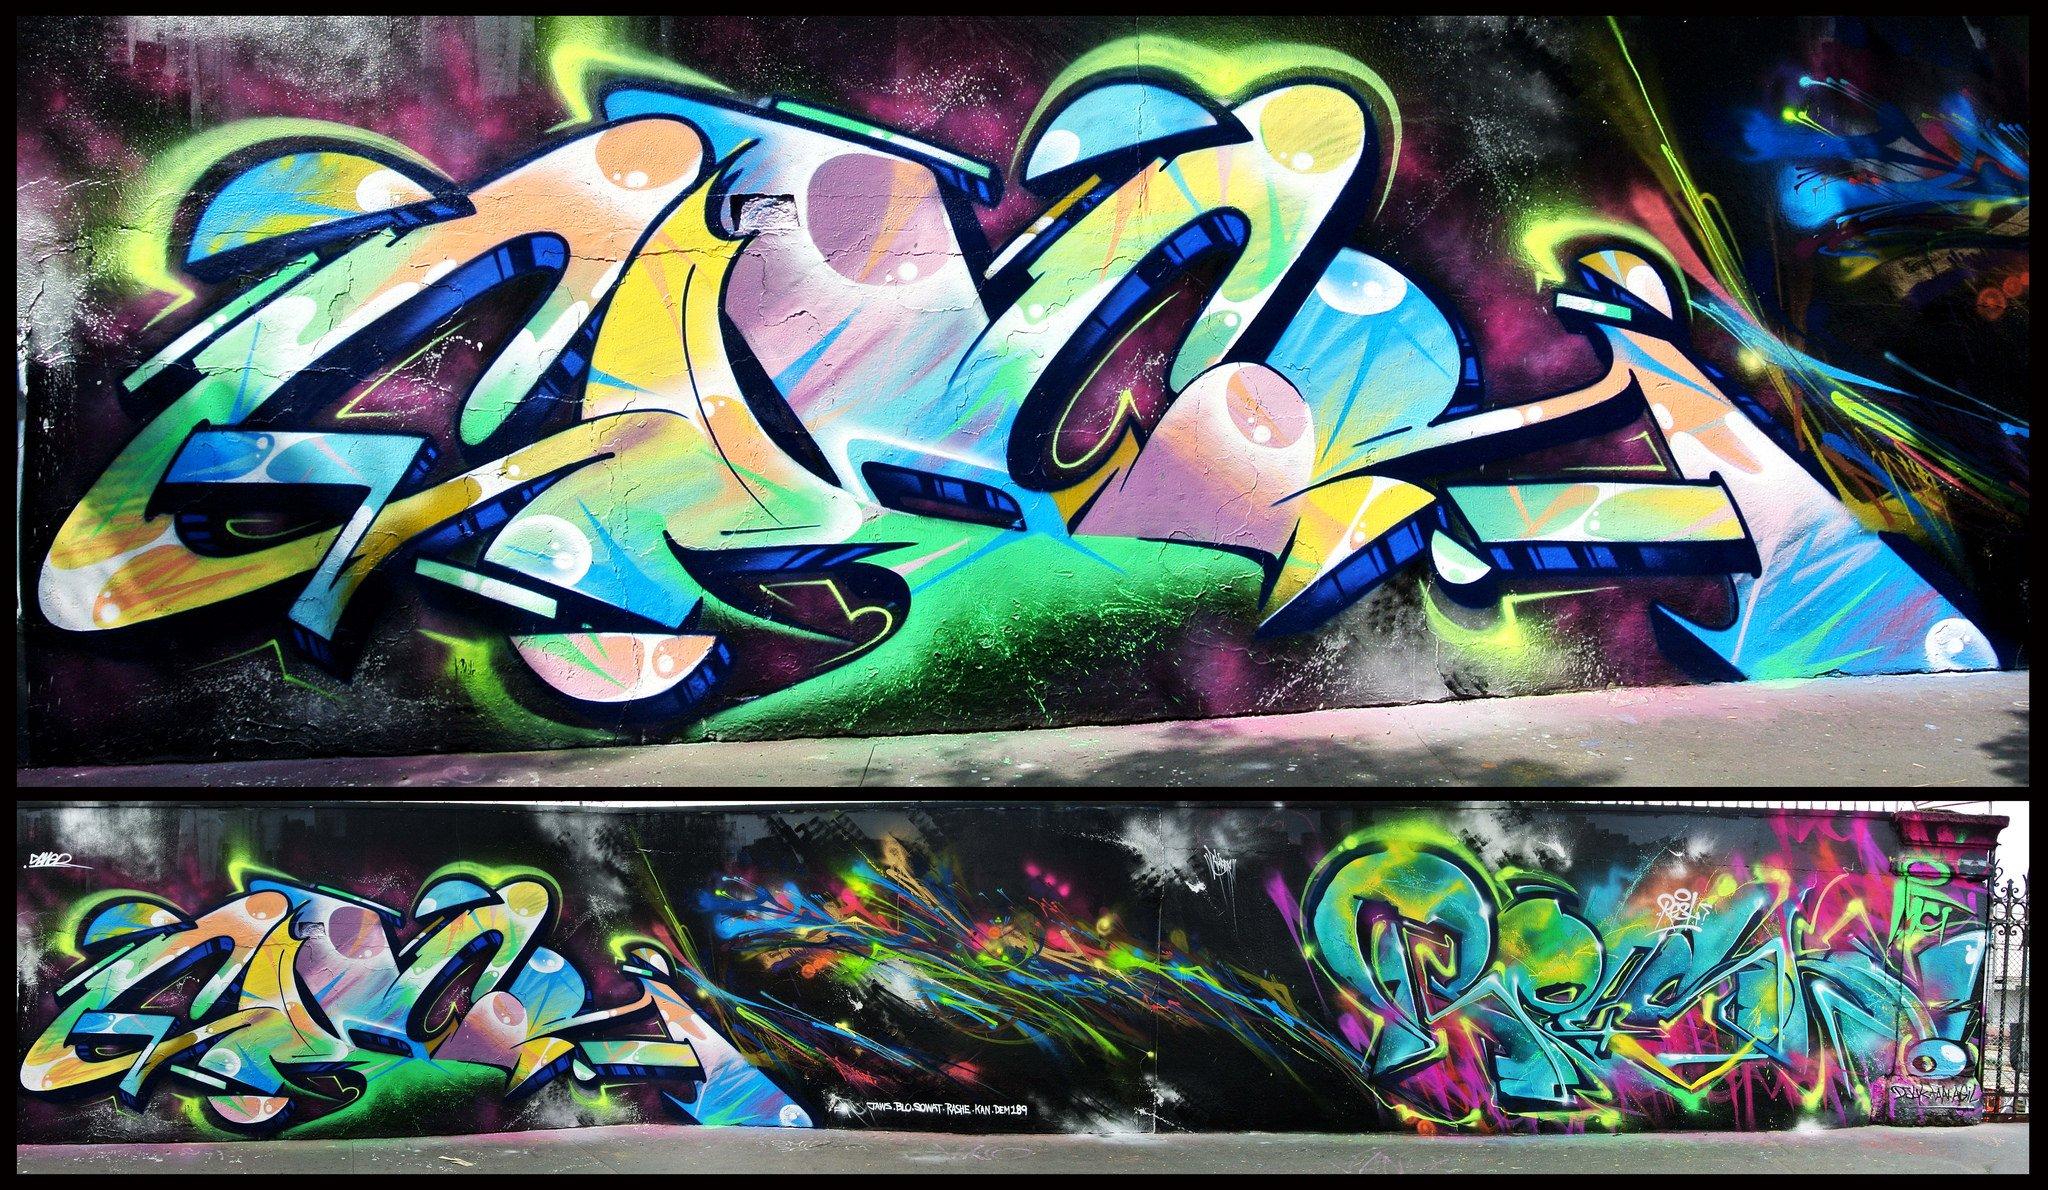 Art Color Graffiti Paint Psychedelic Urban Wall Rue Tag Peinture Wallpaper  | 2048x1190 | 448797 | WallpaperUP